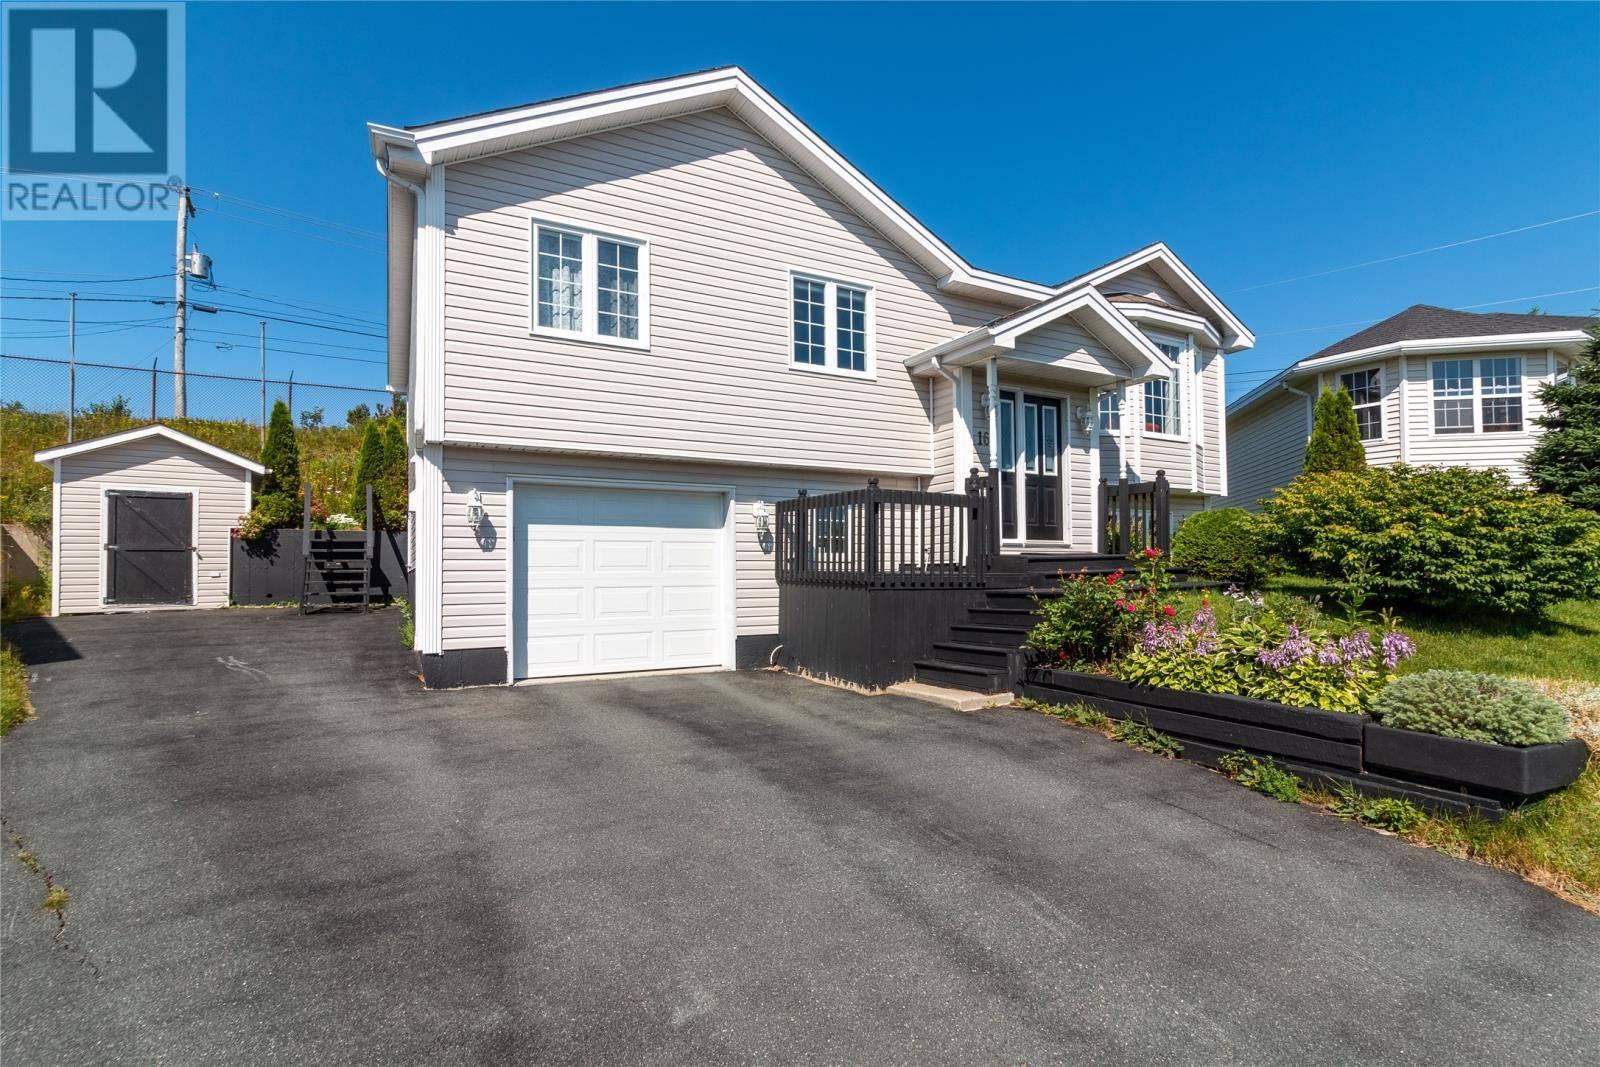 House for sale at 16 Blue River Pl St. John's Newfoundland - MLS: 1200861